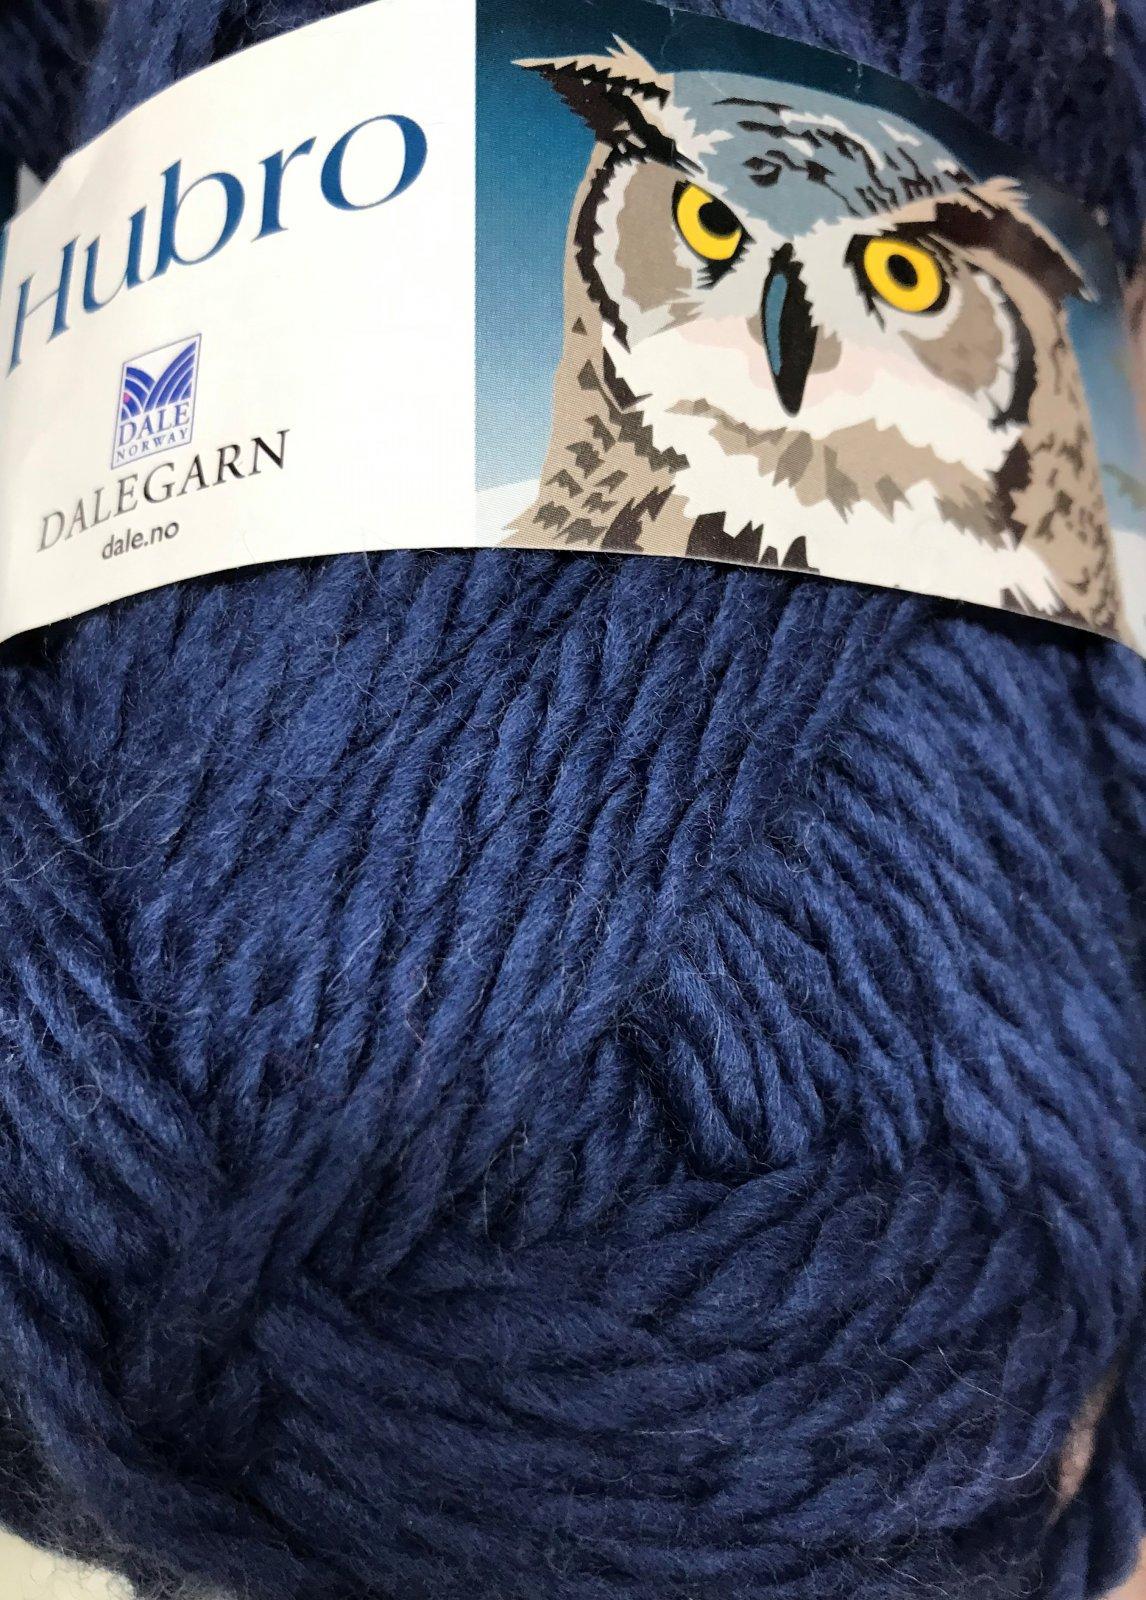 Blue 5764 Hubro Norway 100% wool 72y, 2.5sts=1on #9mm